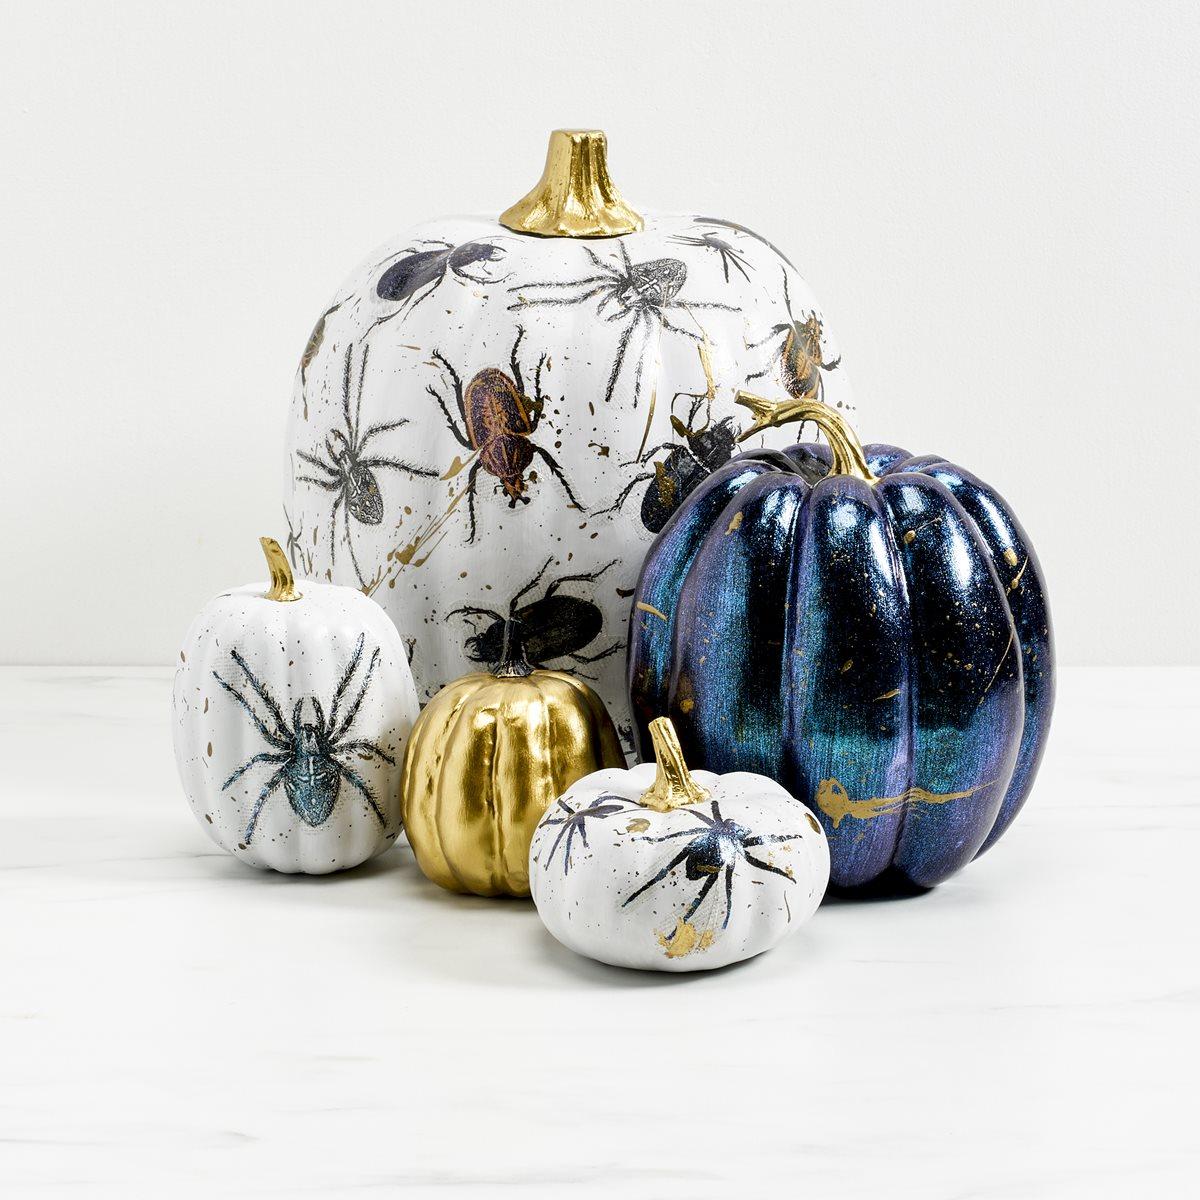 Mod Podge Bug Pumpkins